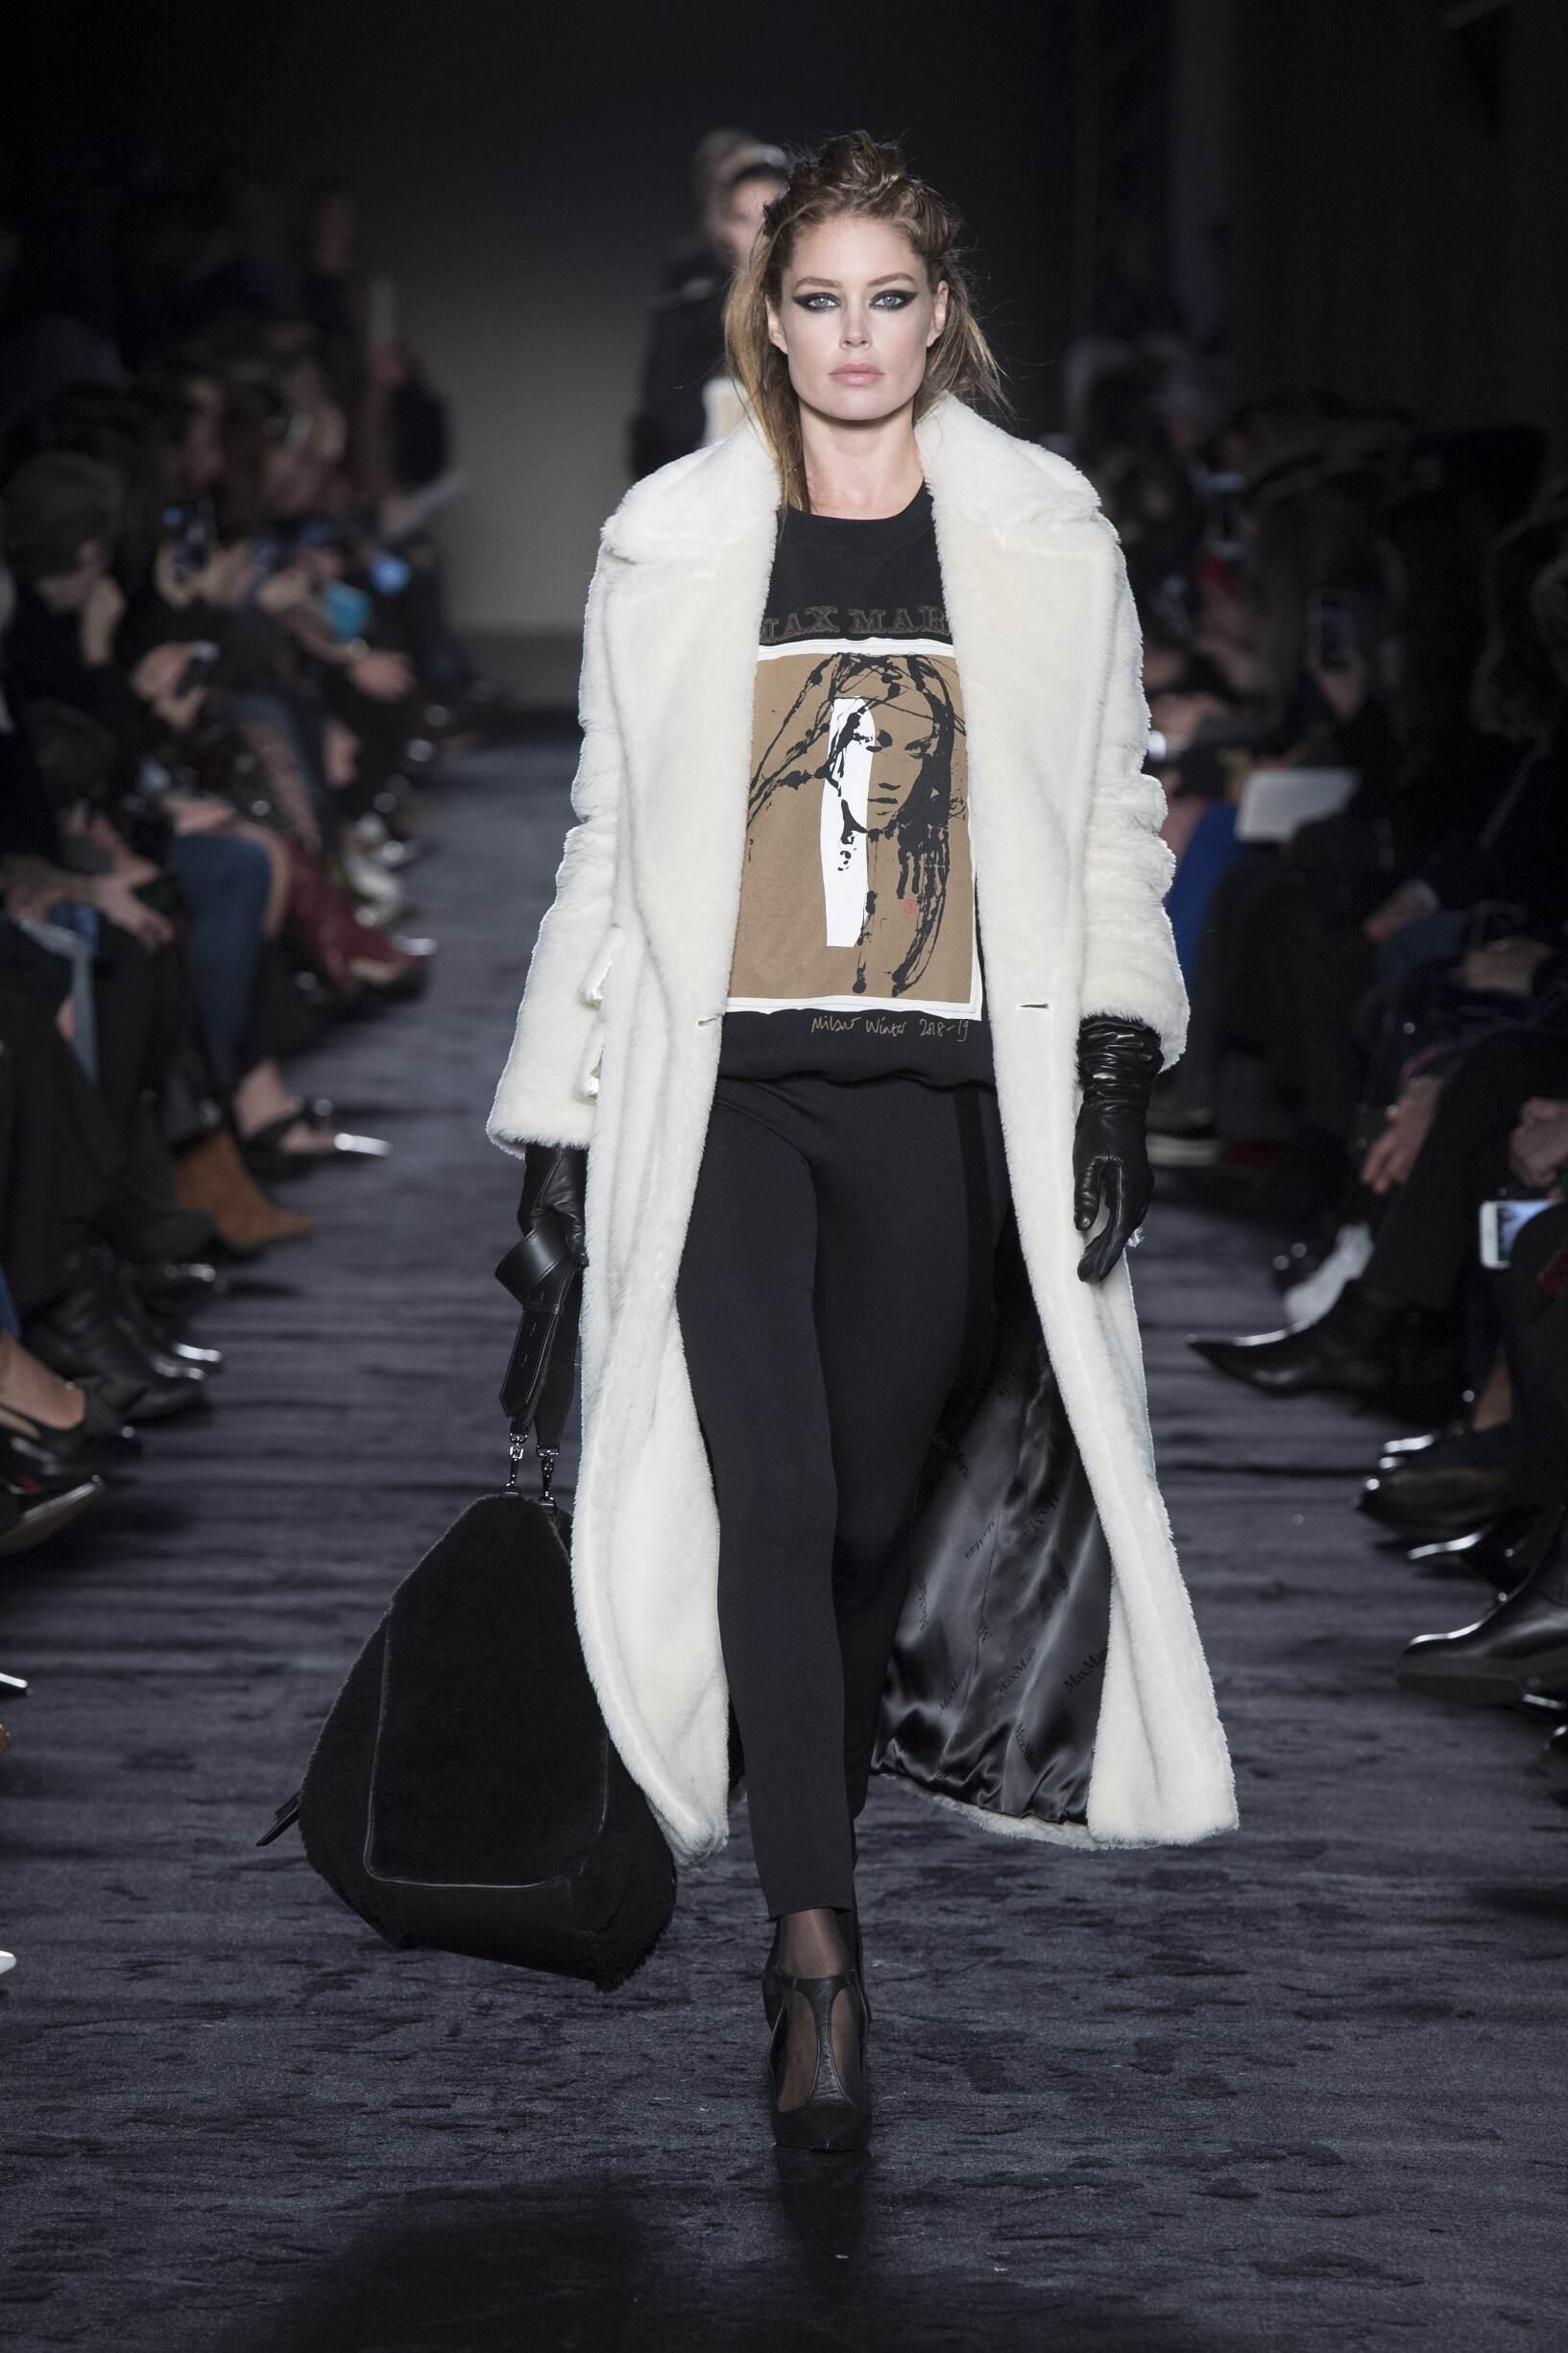 2018 Catwalk Max Mara Woman Fashion Show Winter